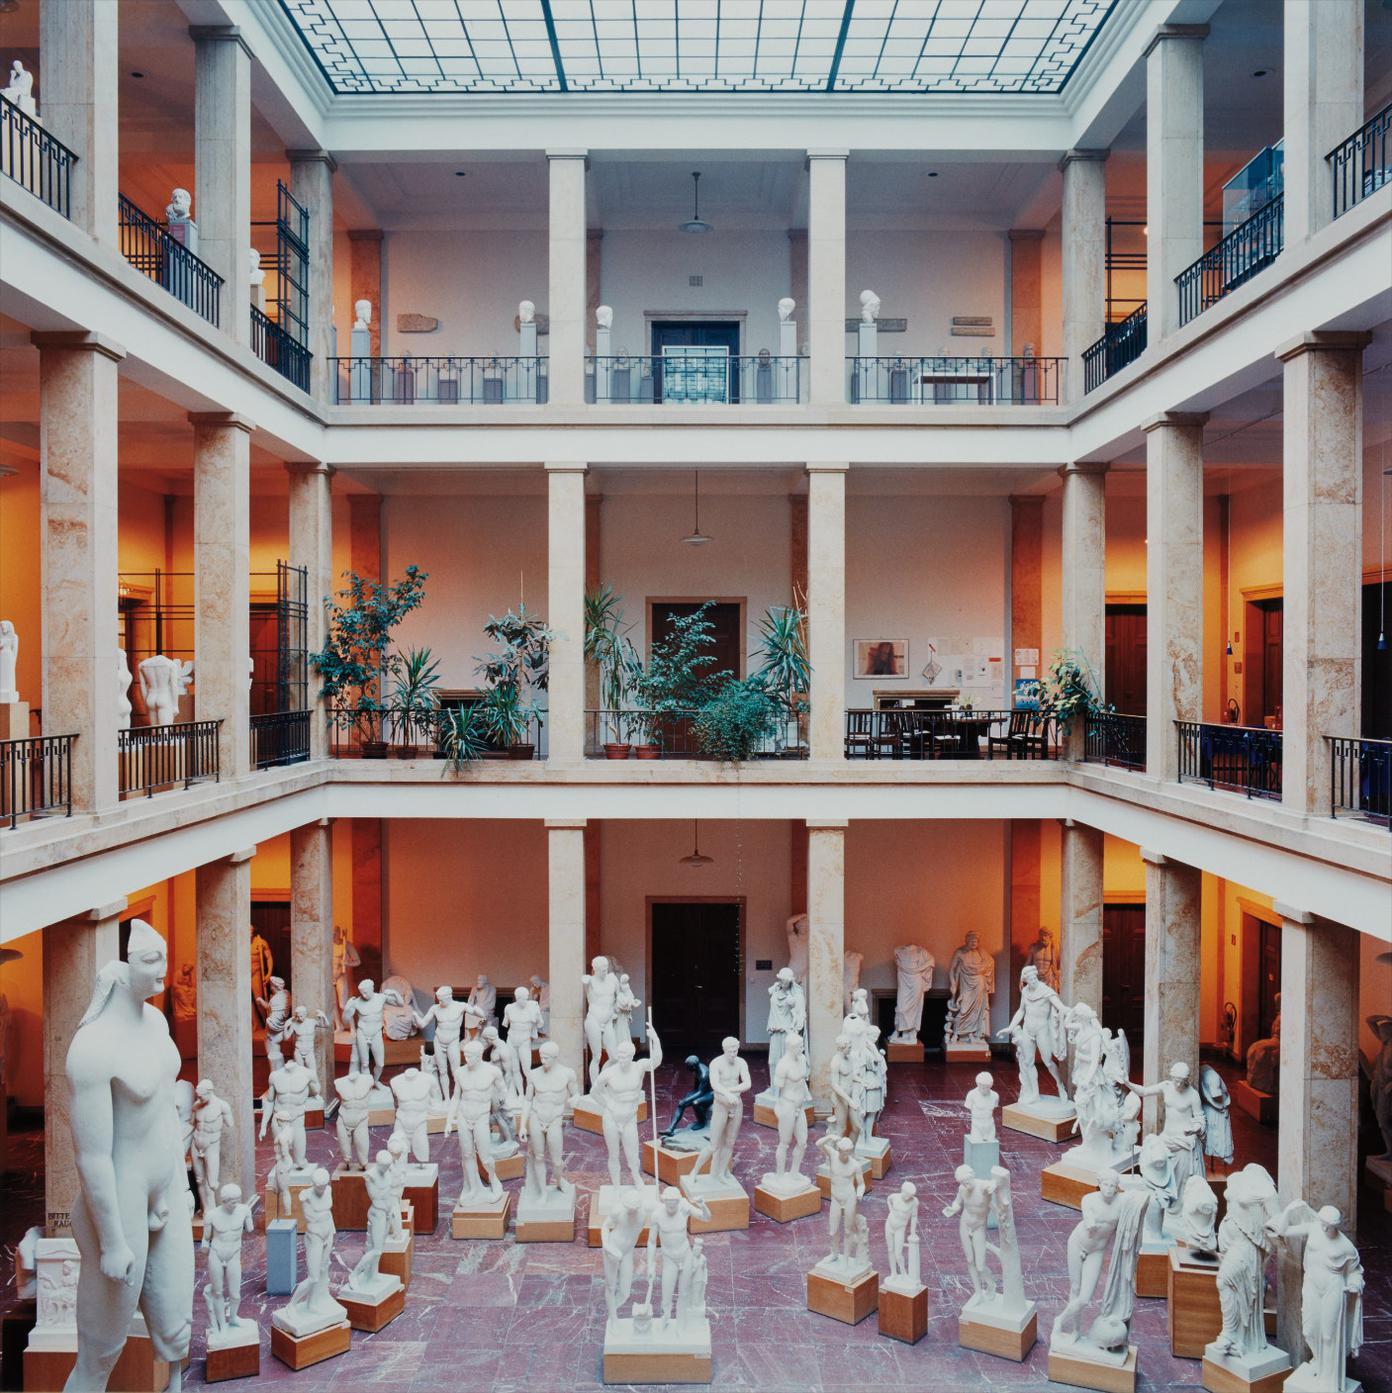 Candida Hofer-Zentralinstitut Fur Kunstgeschichte Munchen Iv-2000